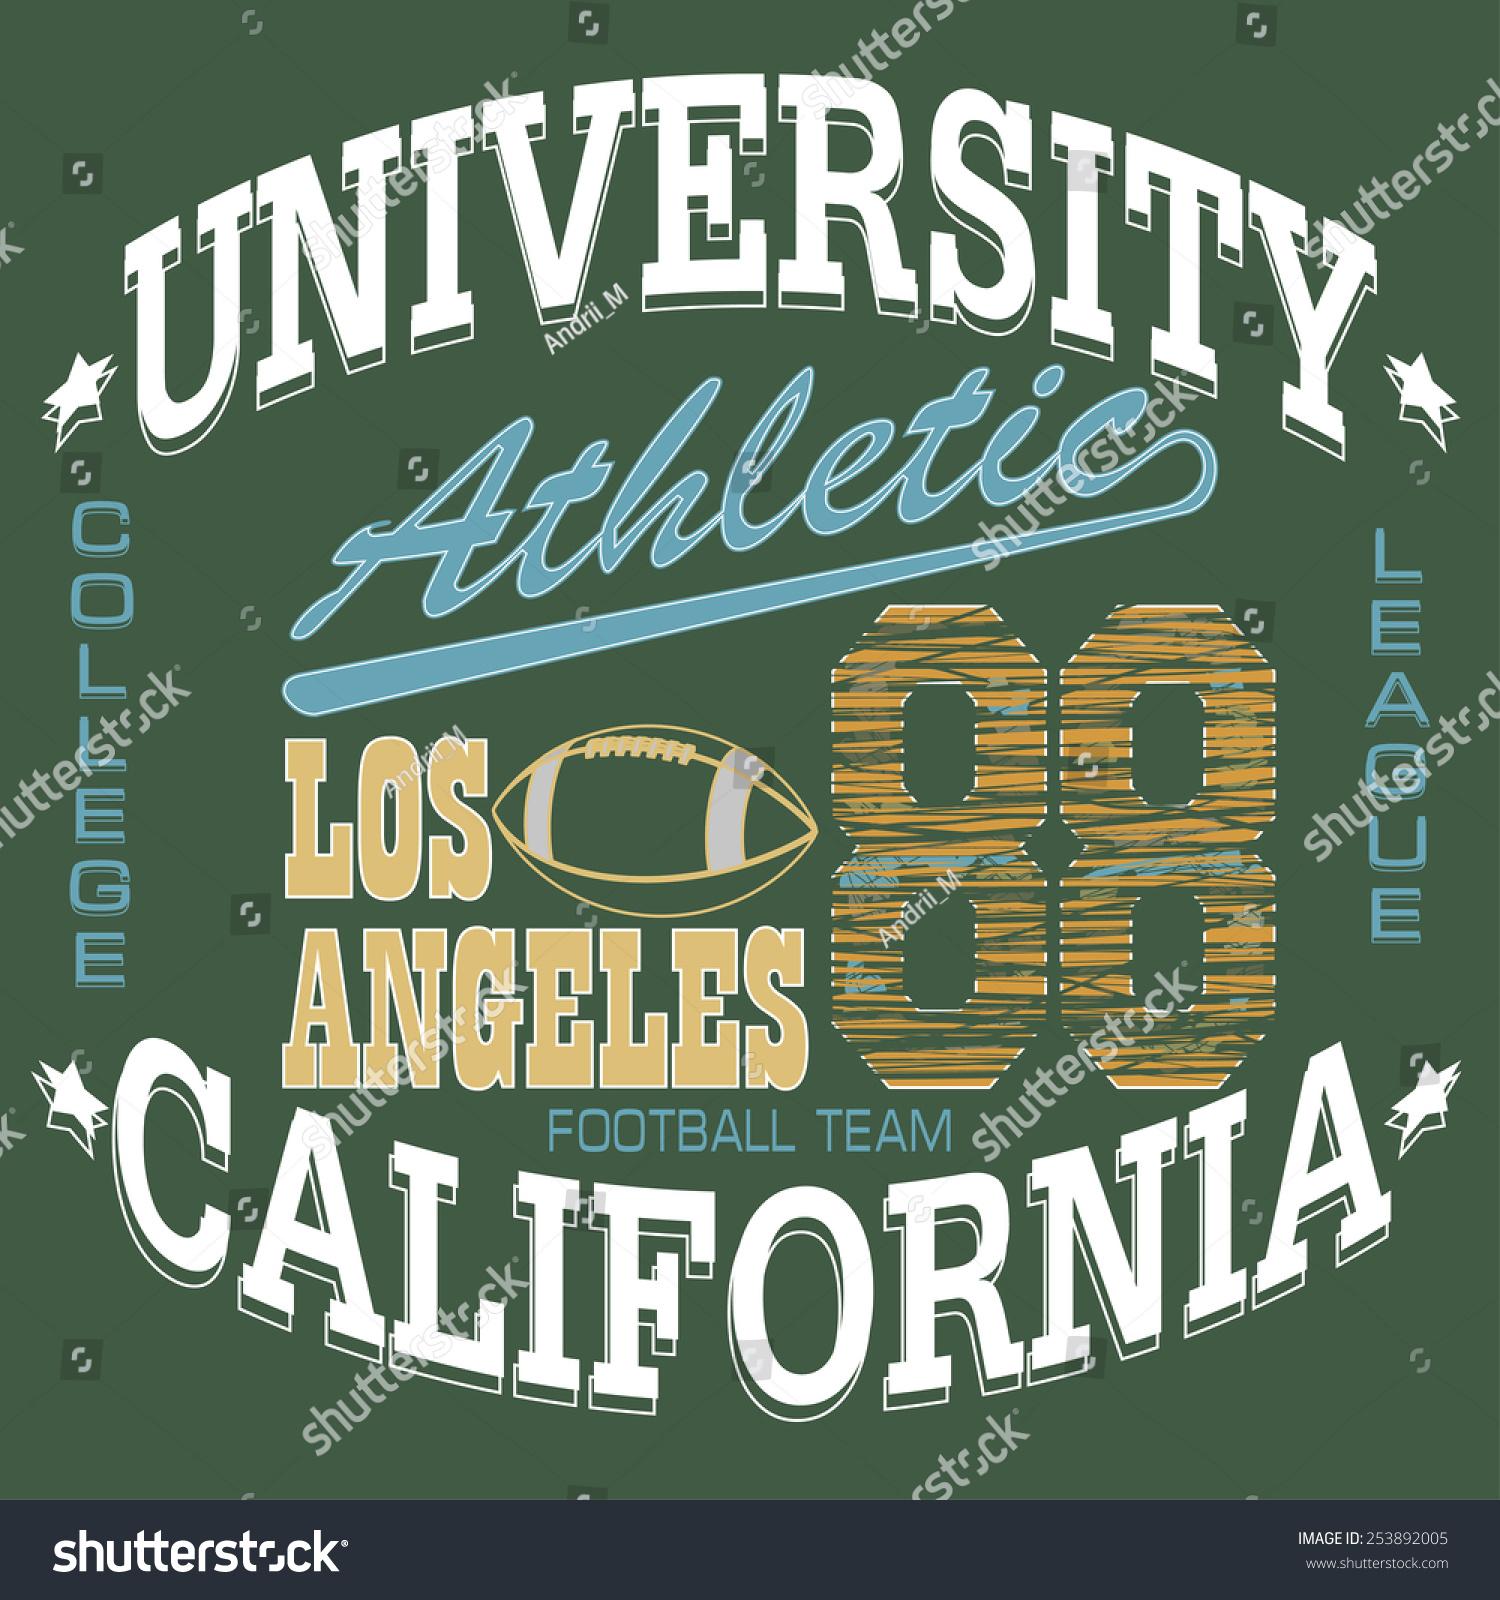 2fe647e63 Football T-shirt graphics, California Sport Typography, University Athletic  Dept., Vintage Print for sportswear appare - vector illustration